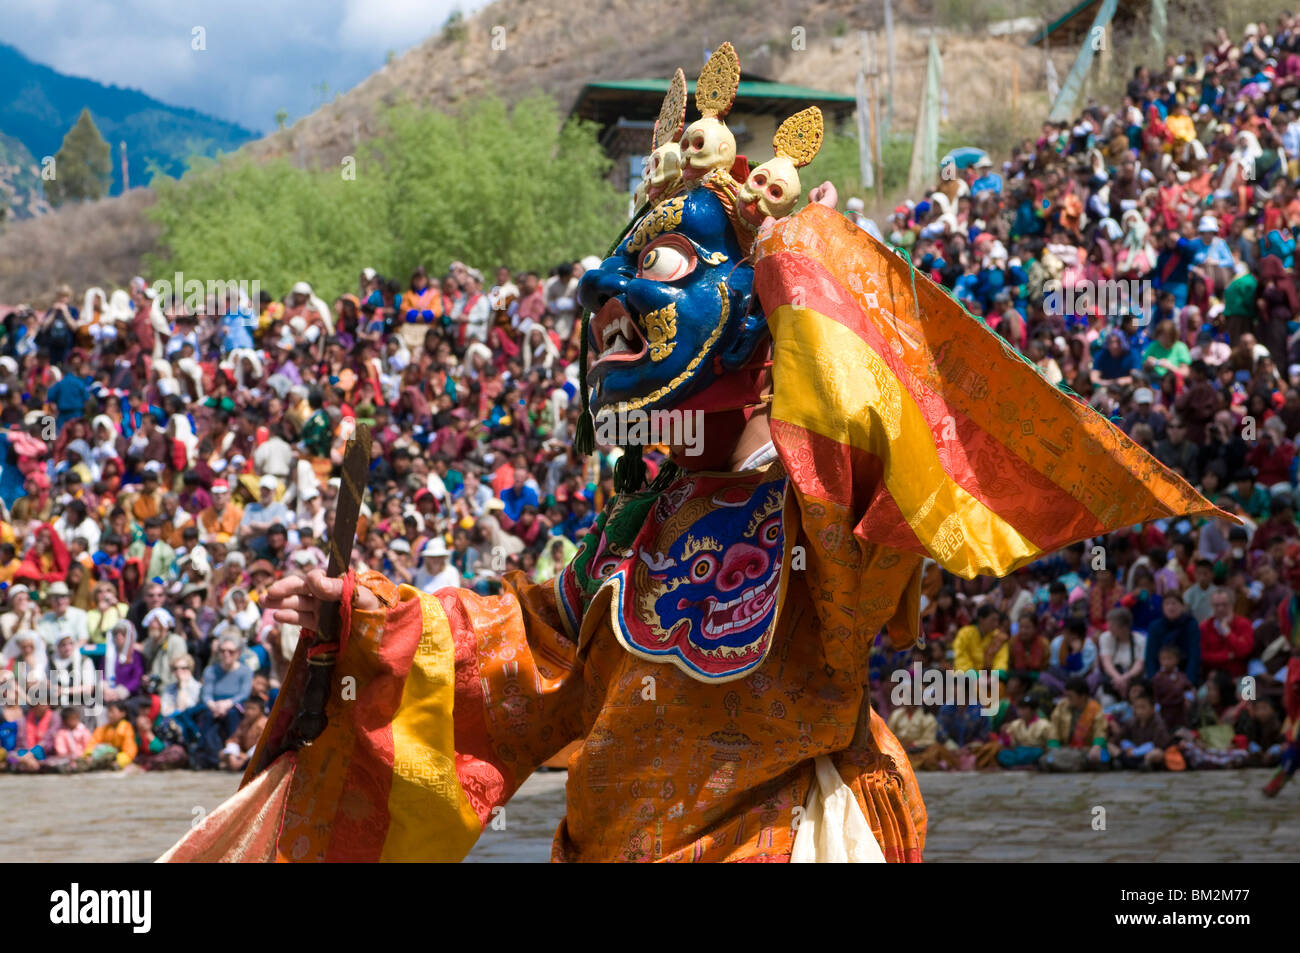 Traditionally dressed dancer at the Paro Tsechu, a religious dance ceremony, Paro, Bhutan - Stock Image